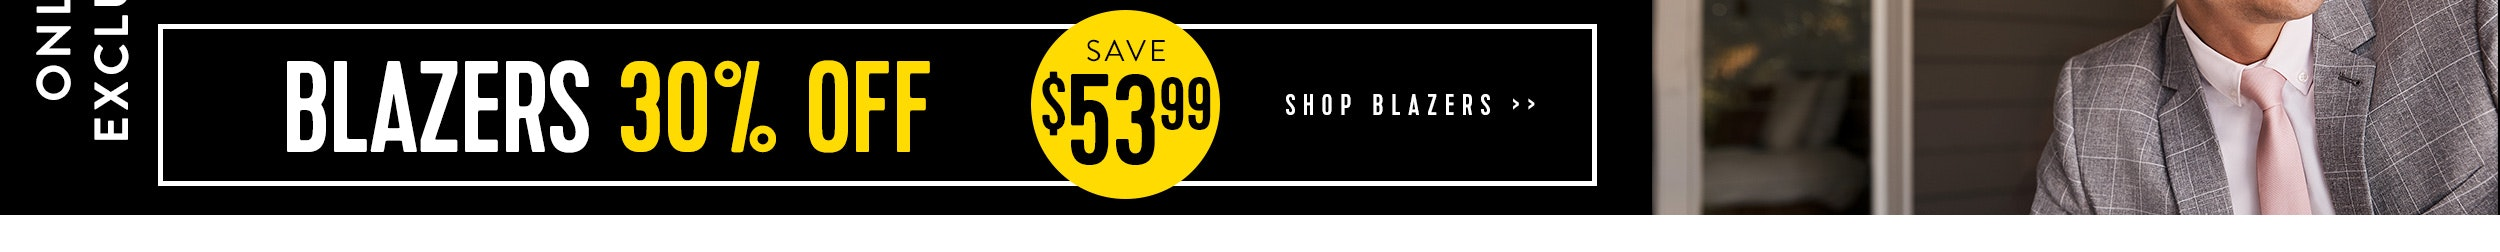 Online Exclusive All Suits $179.99 & Blazers 30% Off